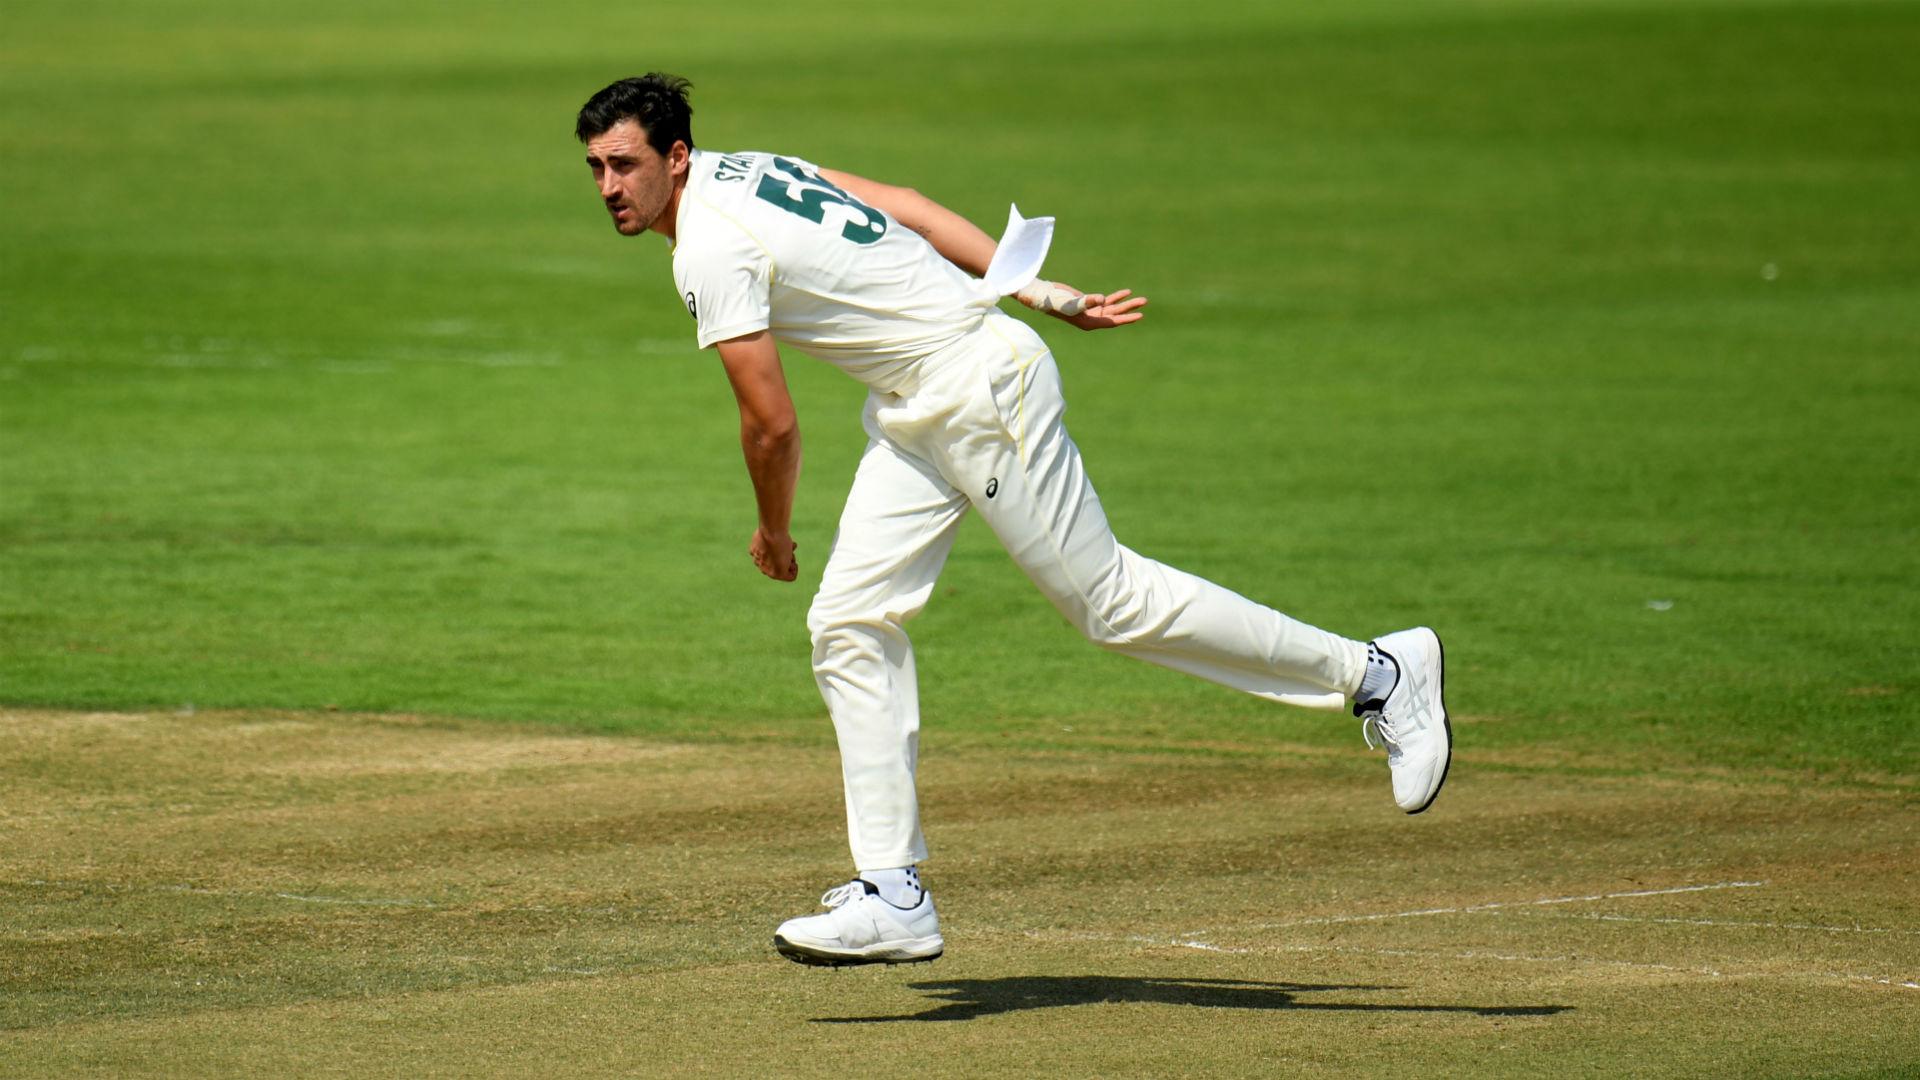 Ashes 2019: Starc and Hazlewood dropped as Australia bat first at Edgbaston